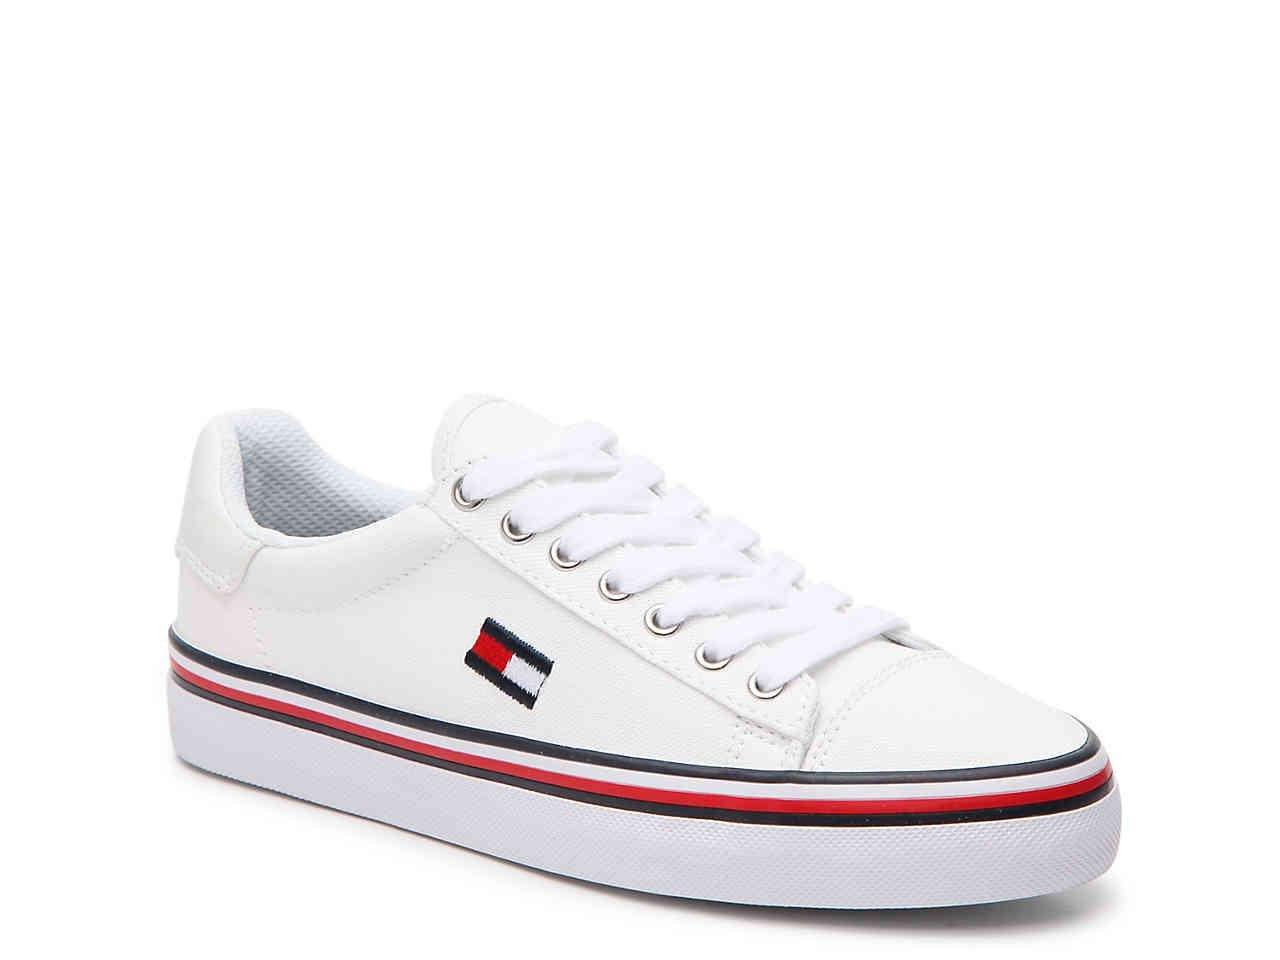 cadb1ad8 Tommy Hilfiger Fressian Sneaker in White - Lyst